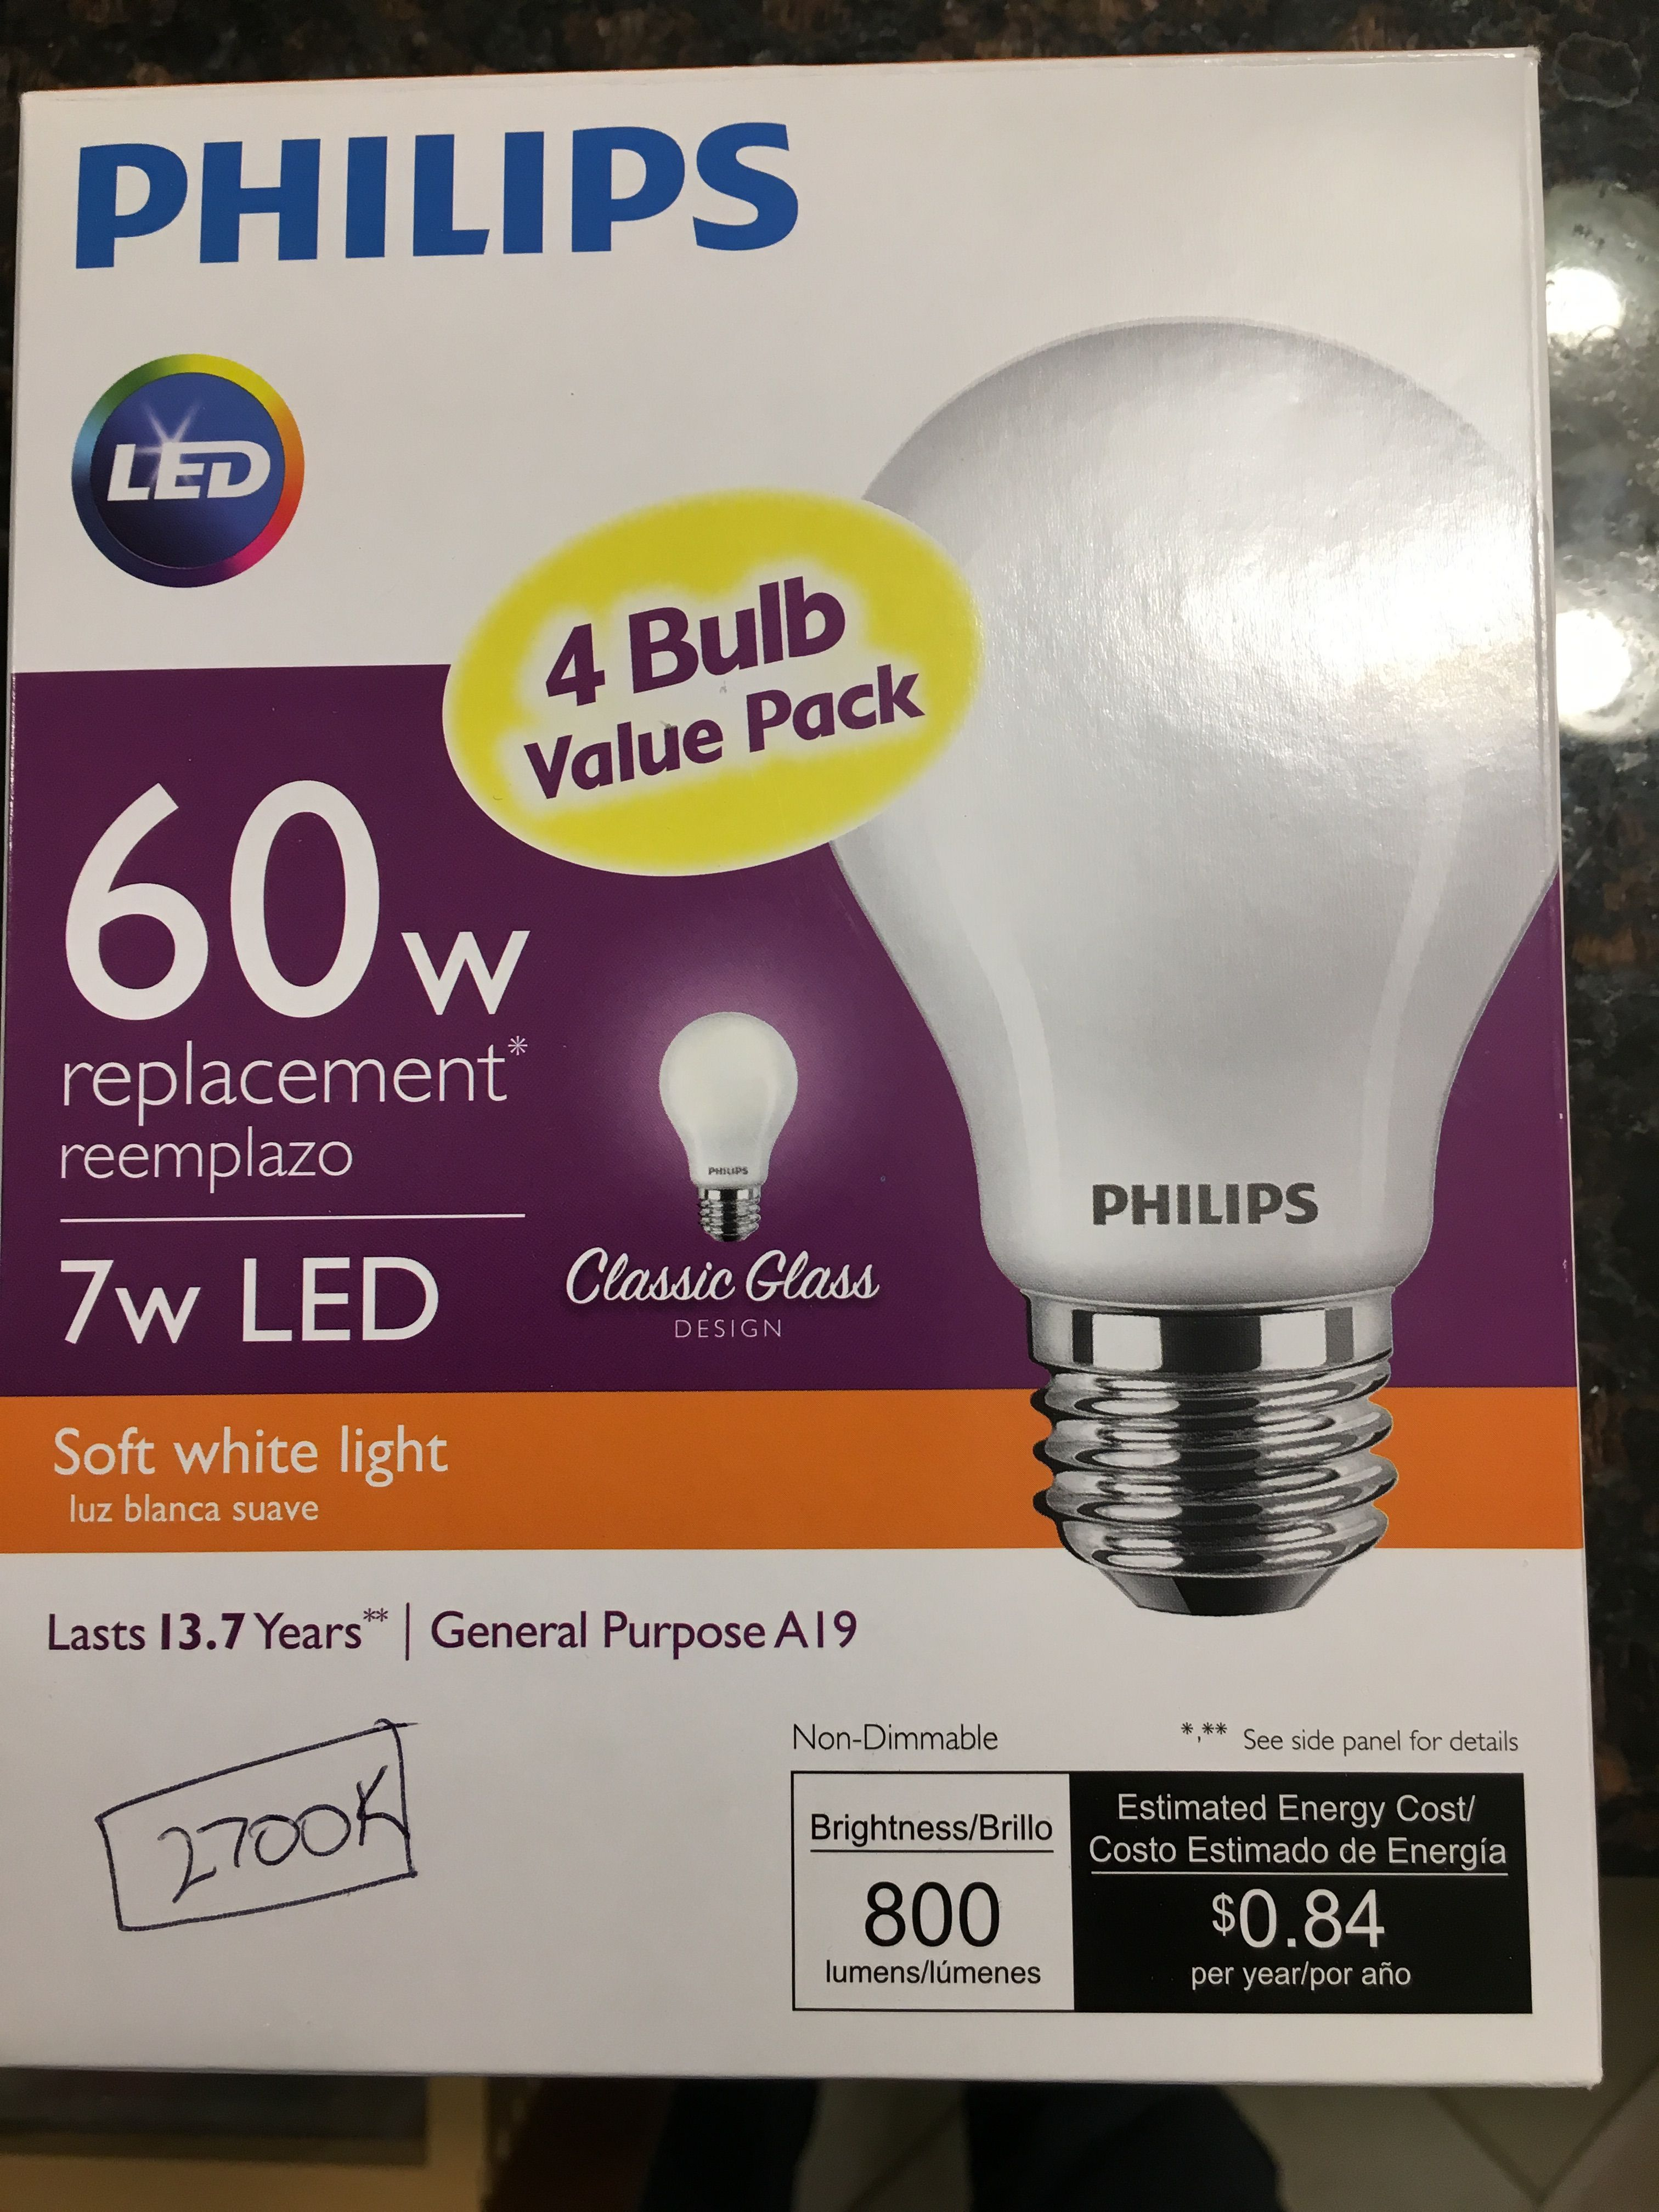 Standardized Bulb For House Philips Classic Glass 800 Lm 2700 K 7 Watts Bulb Glass Light Bulb